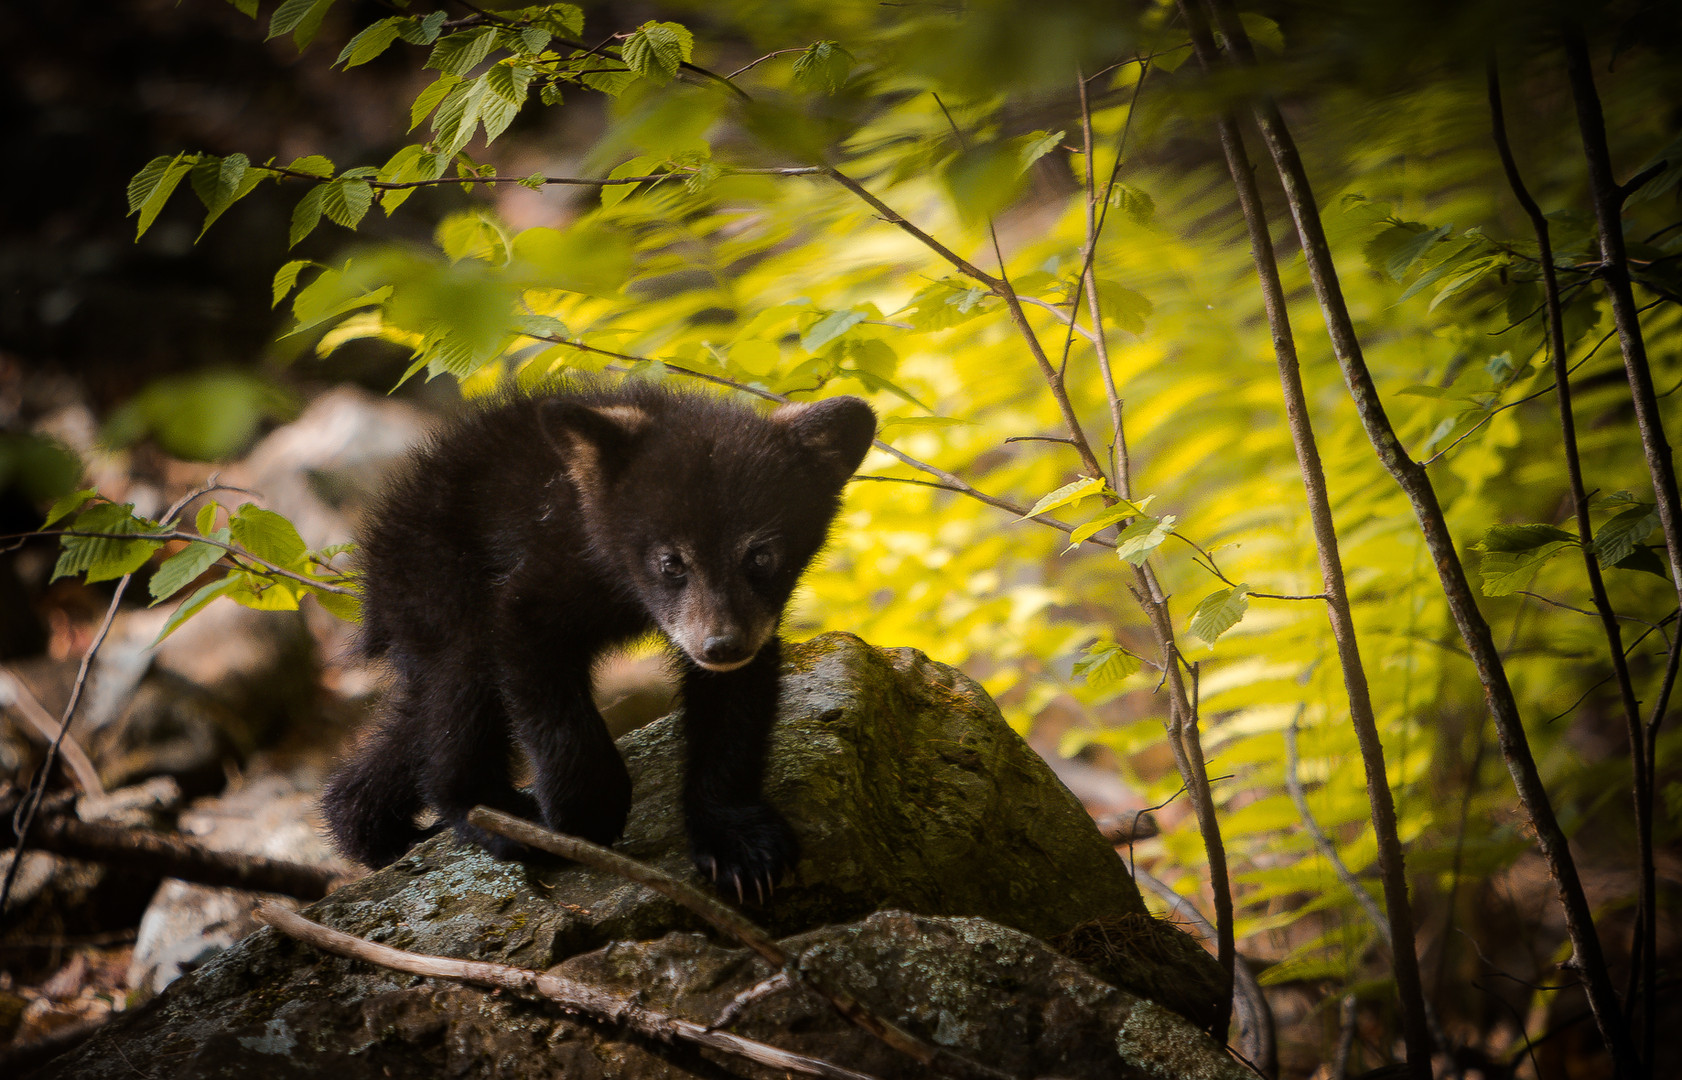 Wild Cub.